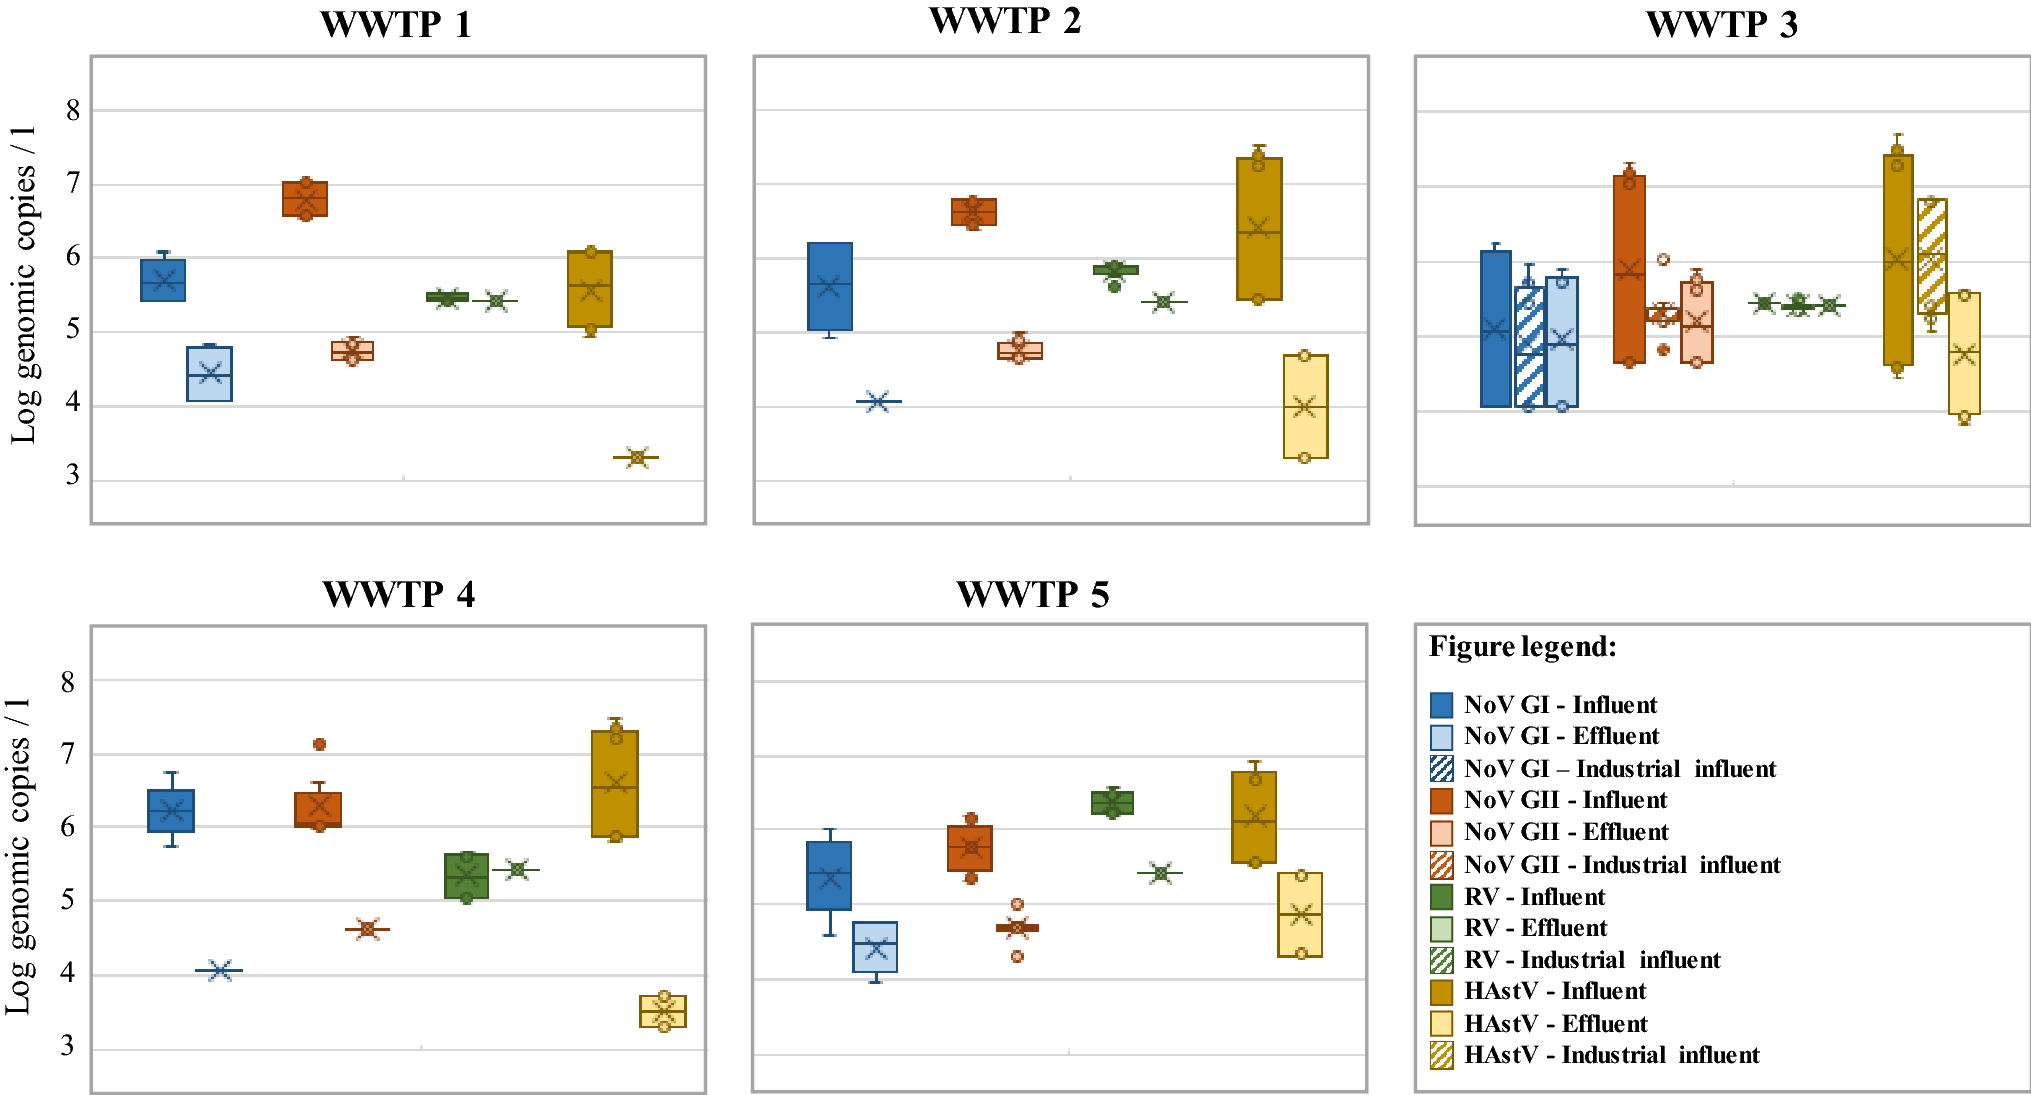 Interlaboratory Comparative Study to Detect Potentially